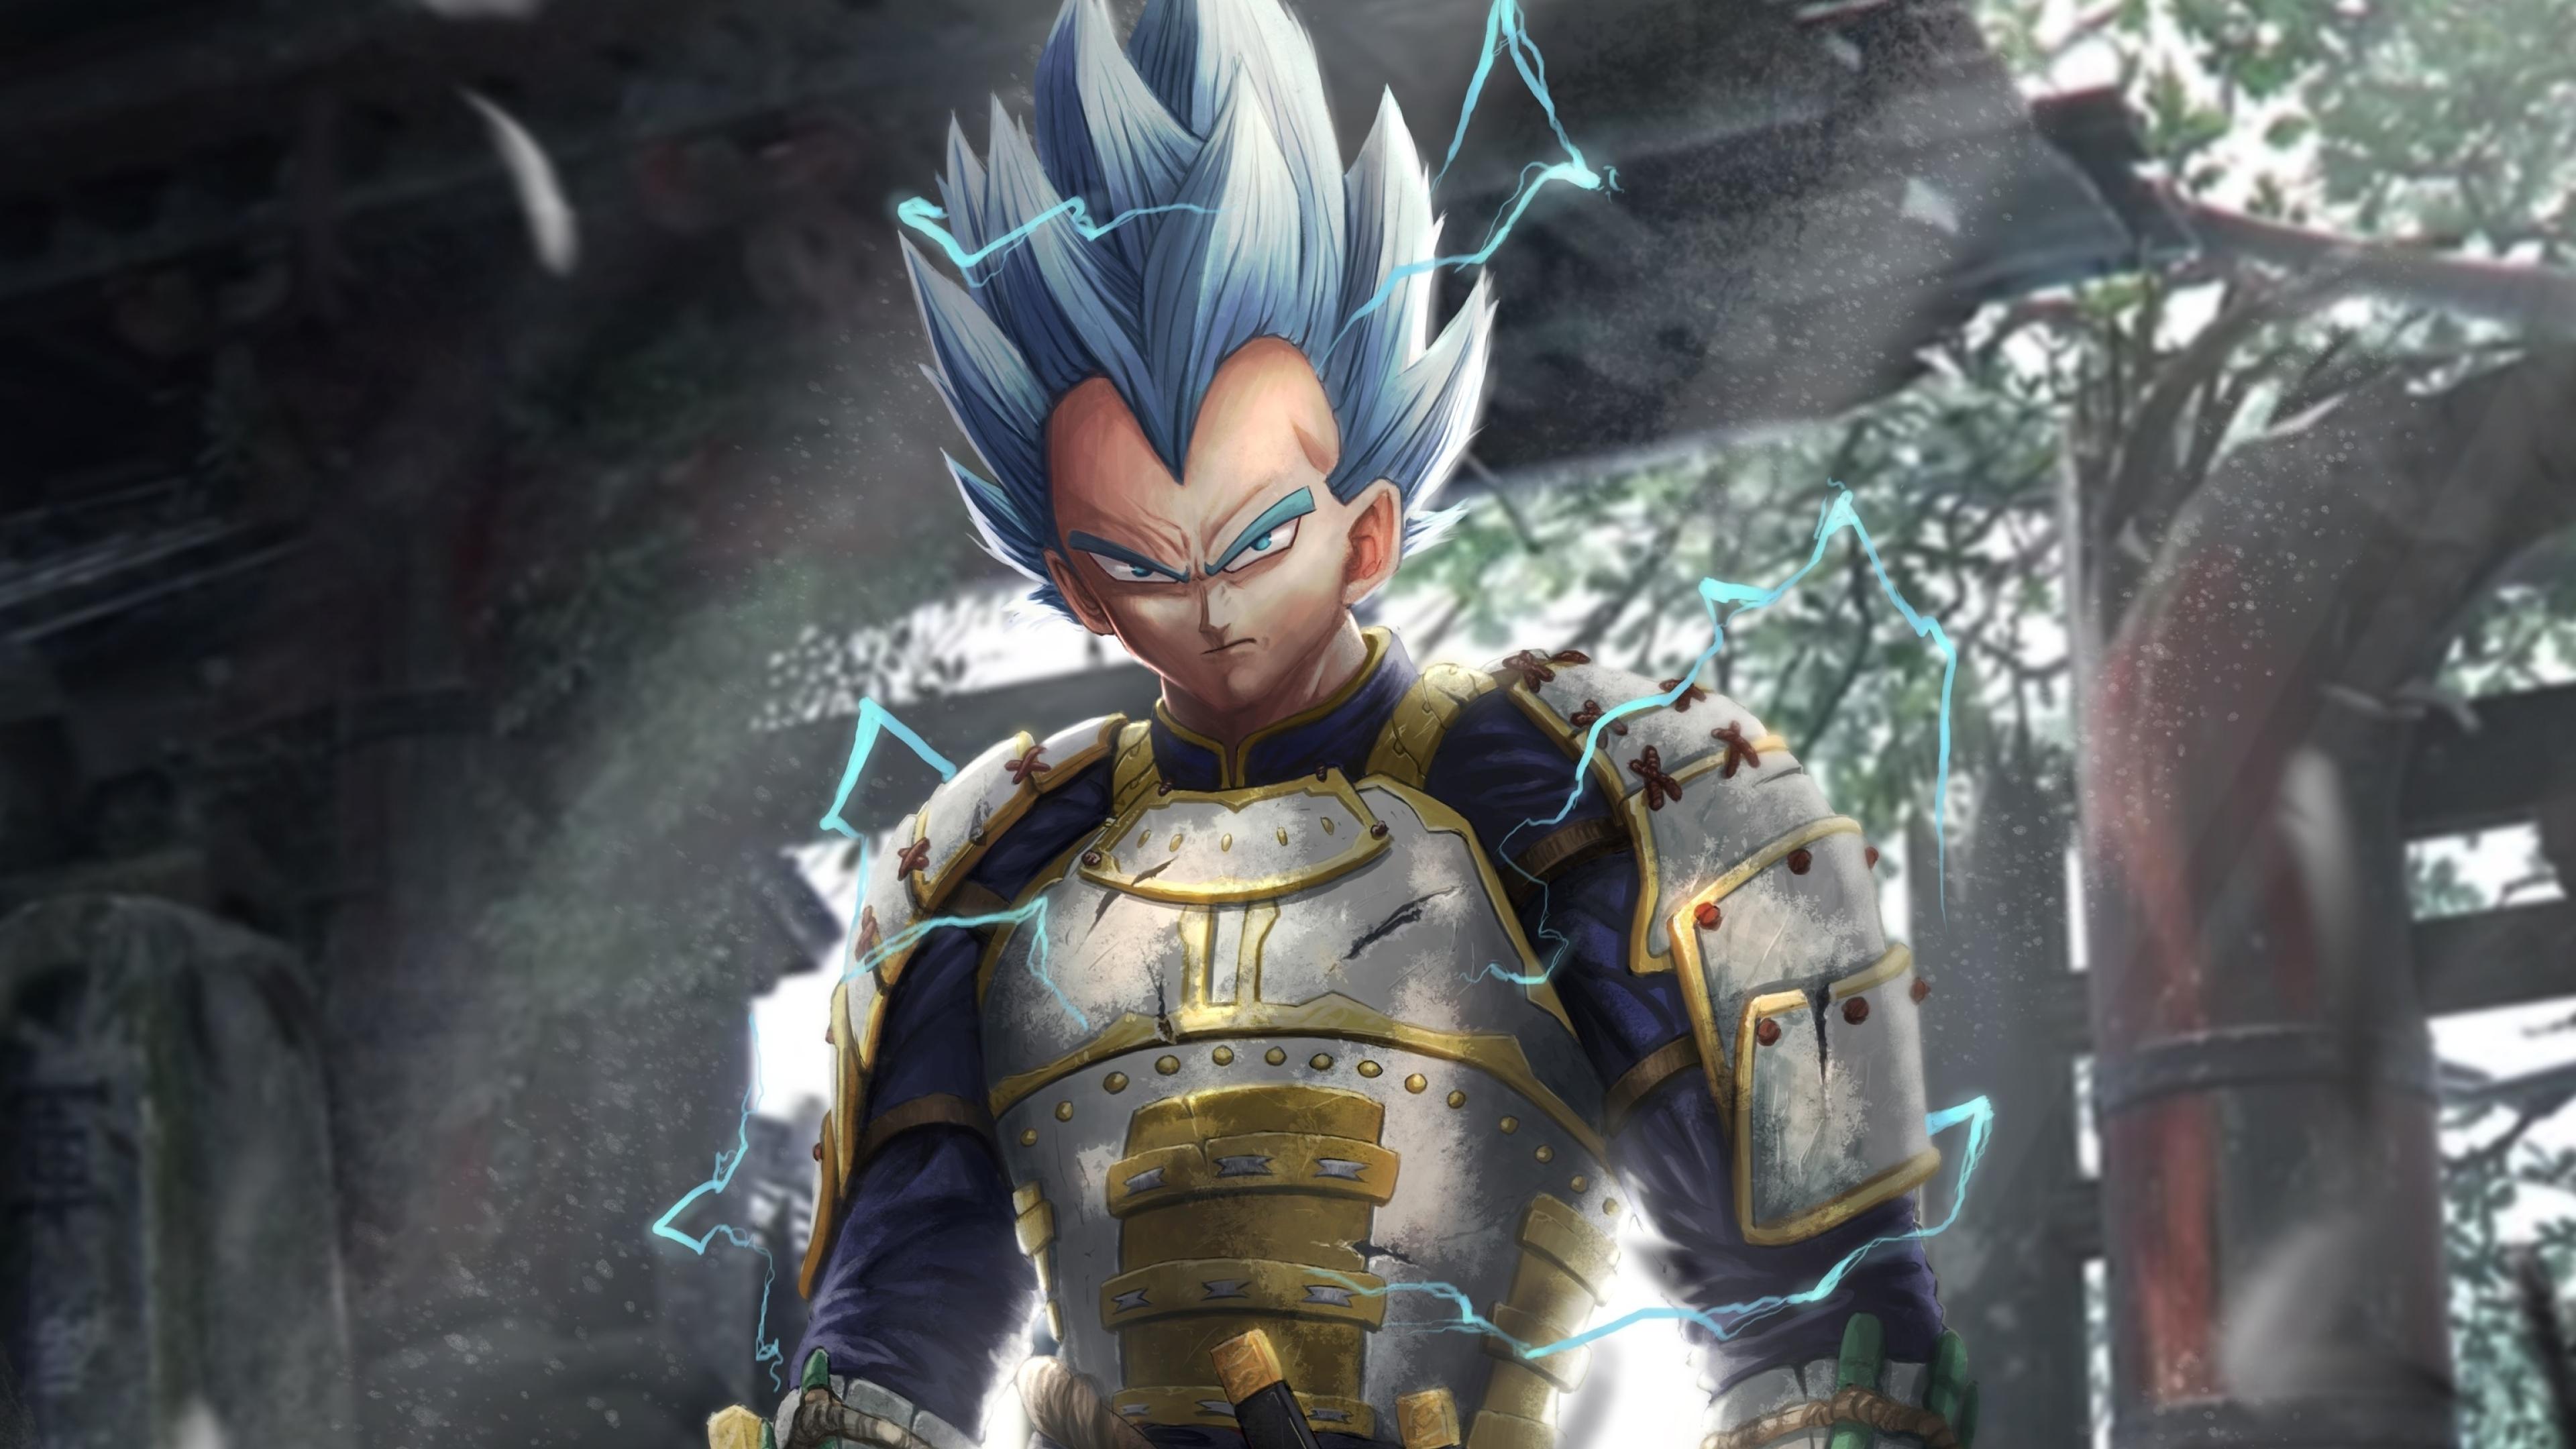 3840x2160 Vegeta Dragon Ball Anime 4k Wallpaper Hd Anime 4k Wallpapers Images Photos And Background